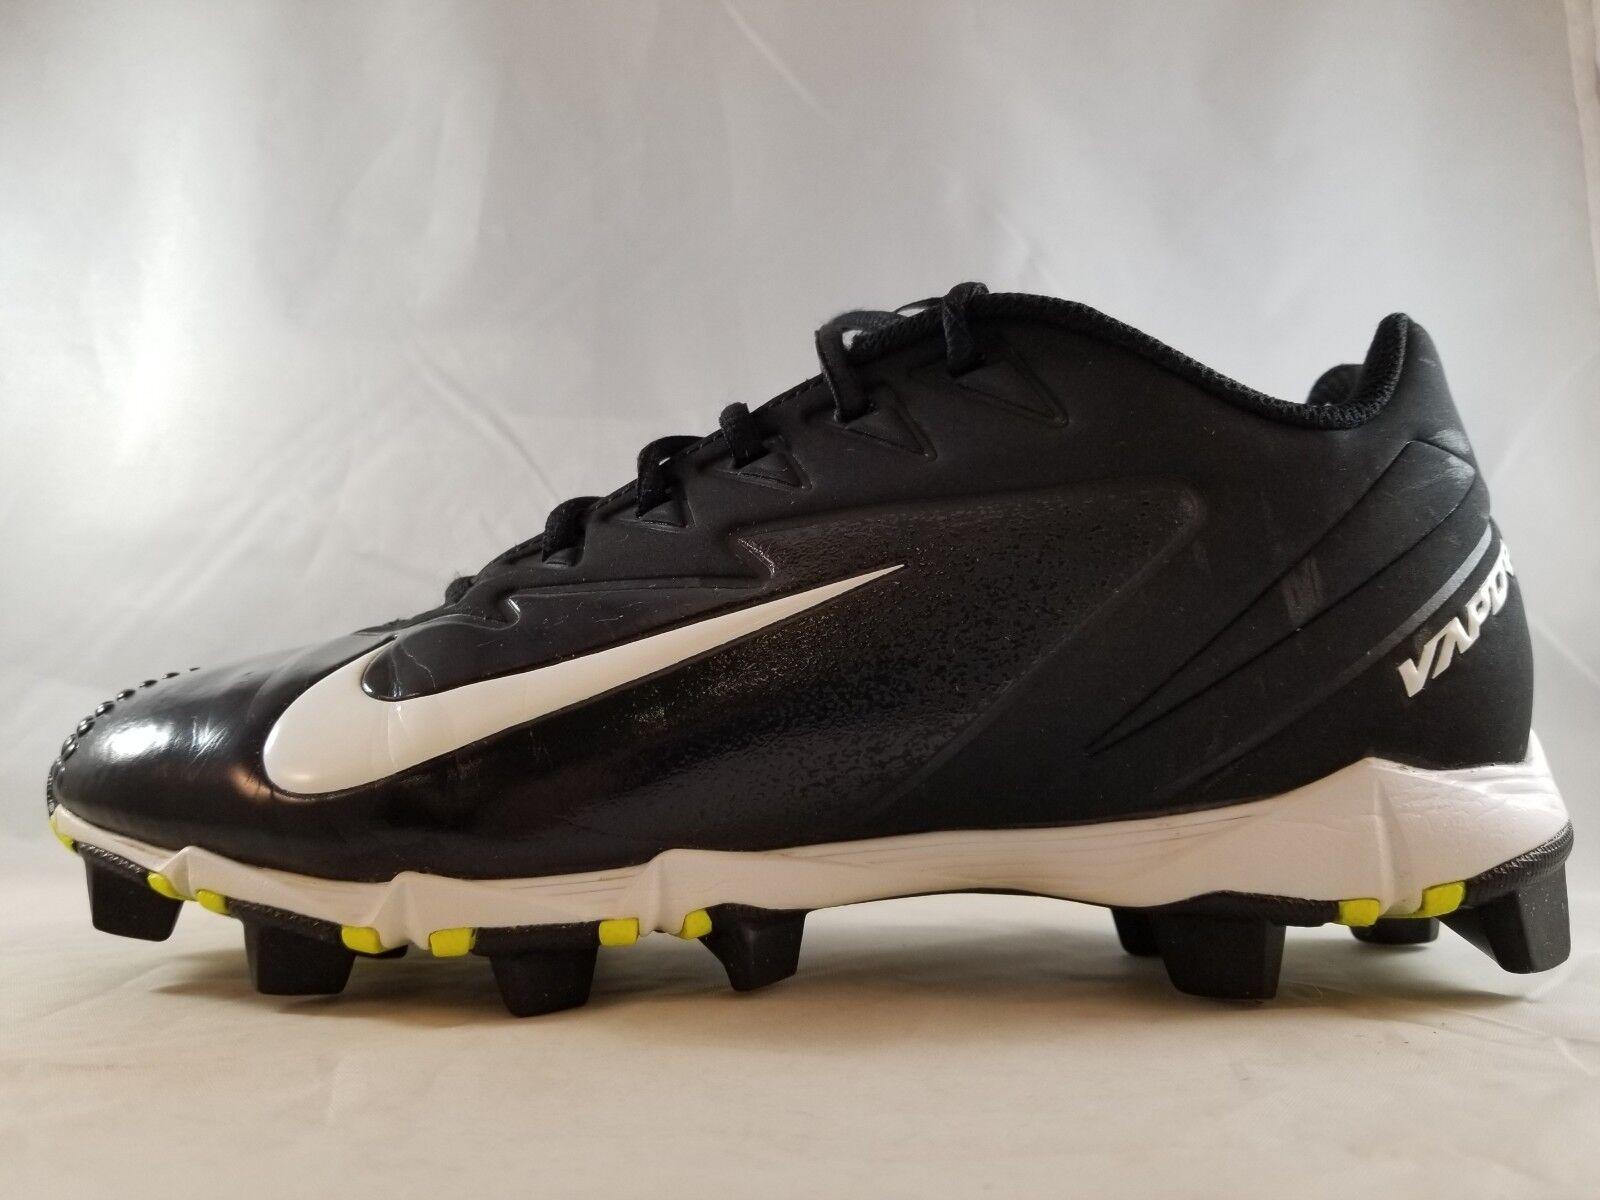 Nike Vapor Ultrafly Keystone Men's Cleats 852688 010 Comfortable Cheap and beautiful fashion